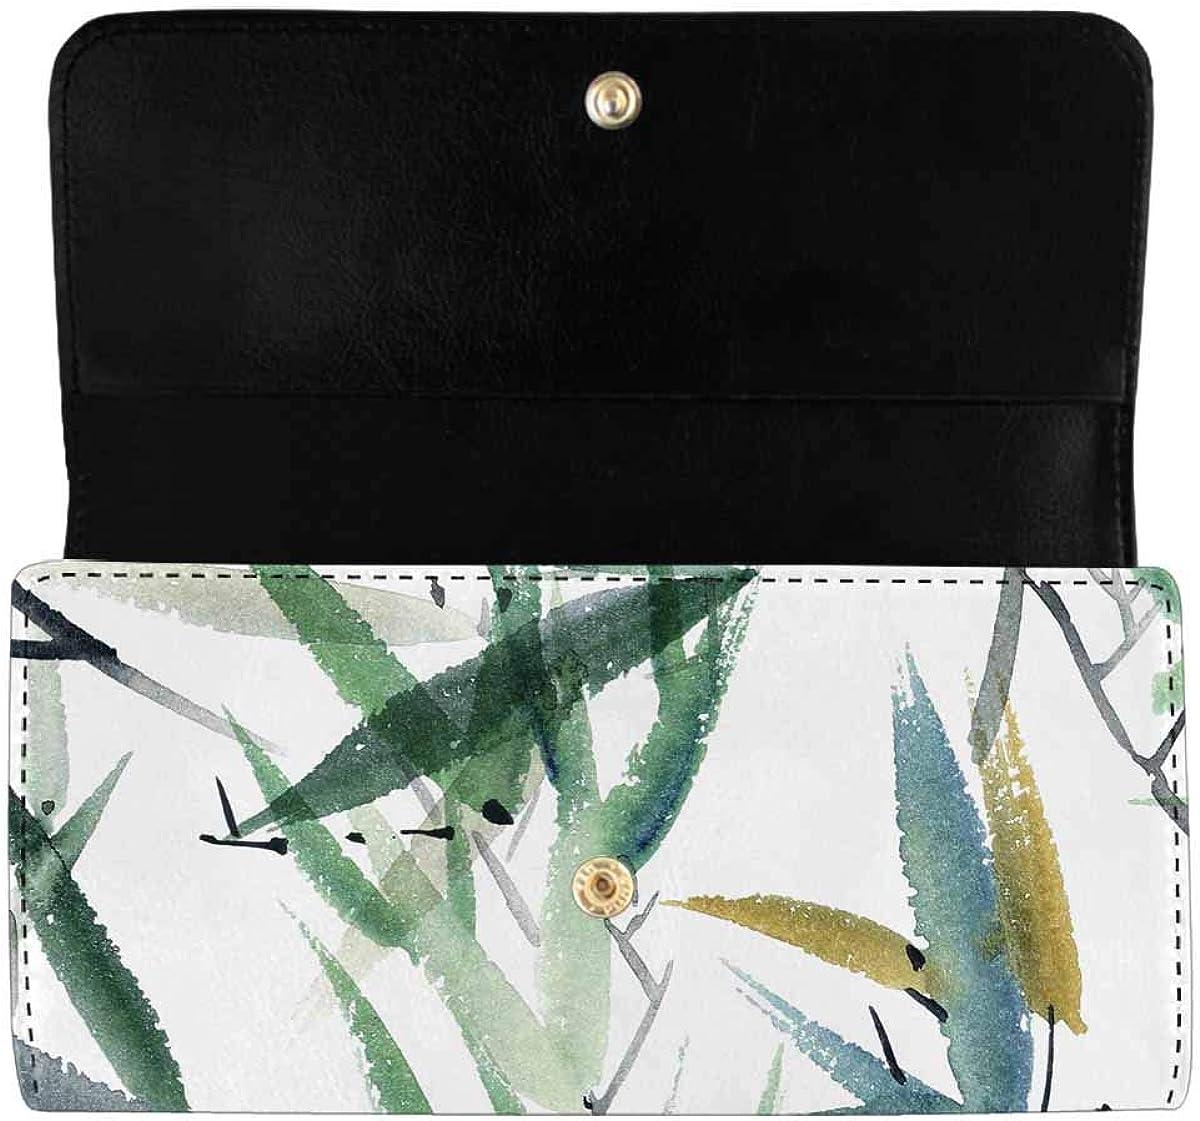 INTERESTPRINT Women's Trifold Clutch Purses Autumn Maple Leaf Long Card Holder Handbags